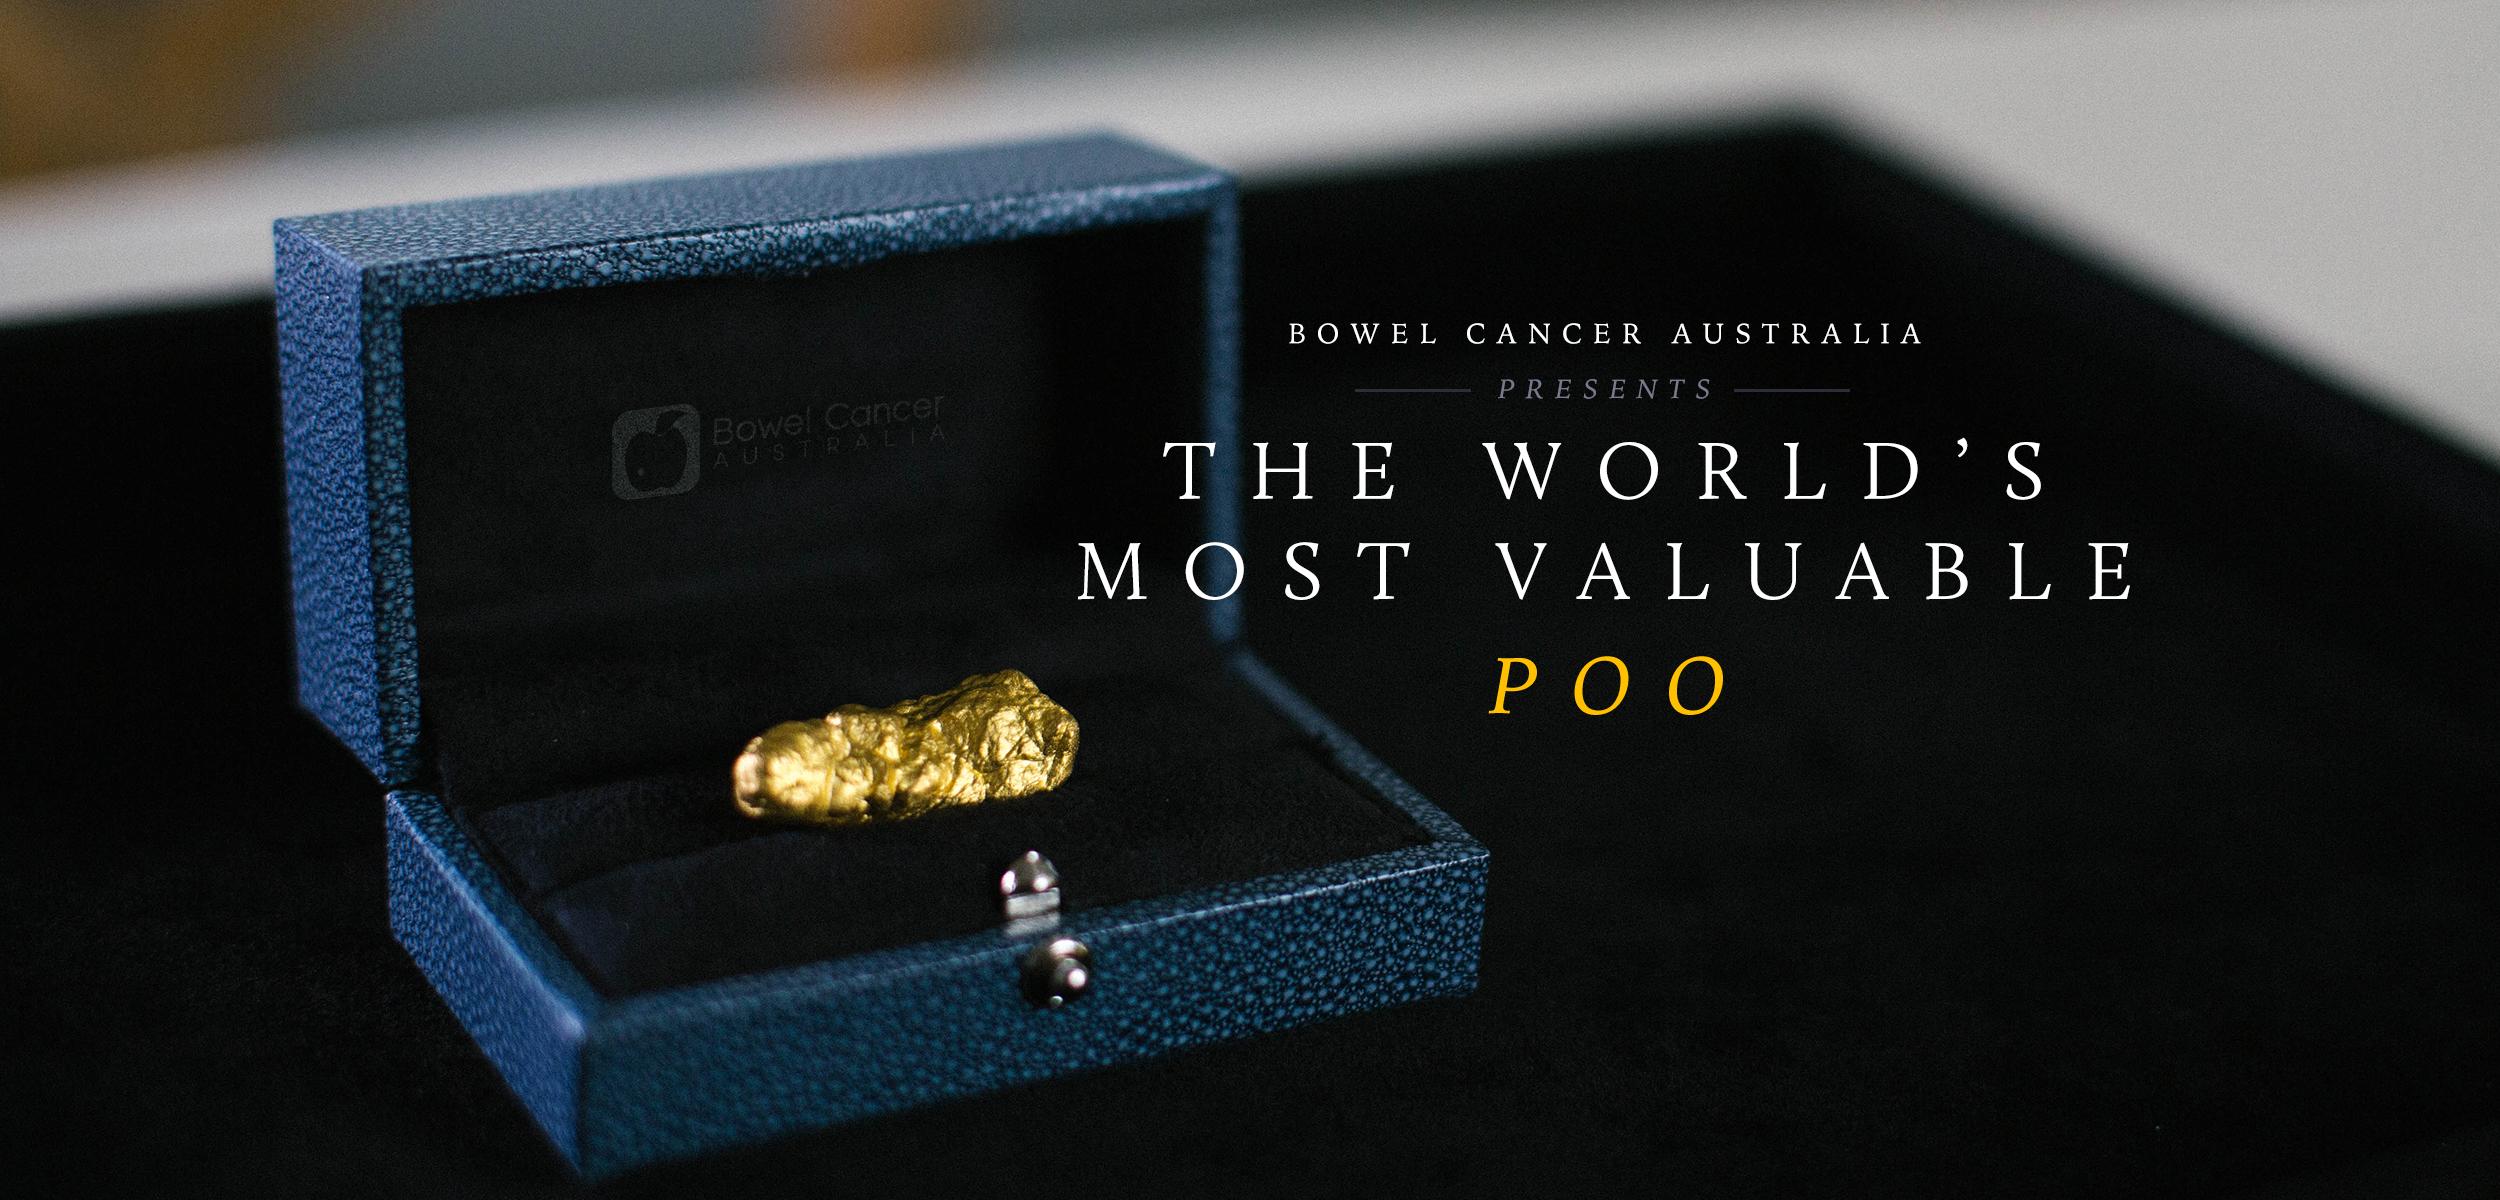 BWM Dentsu Create World's Most Valuable Poo for Bowel Cancer Australia